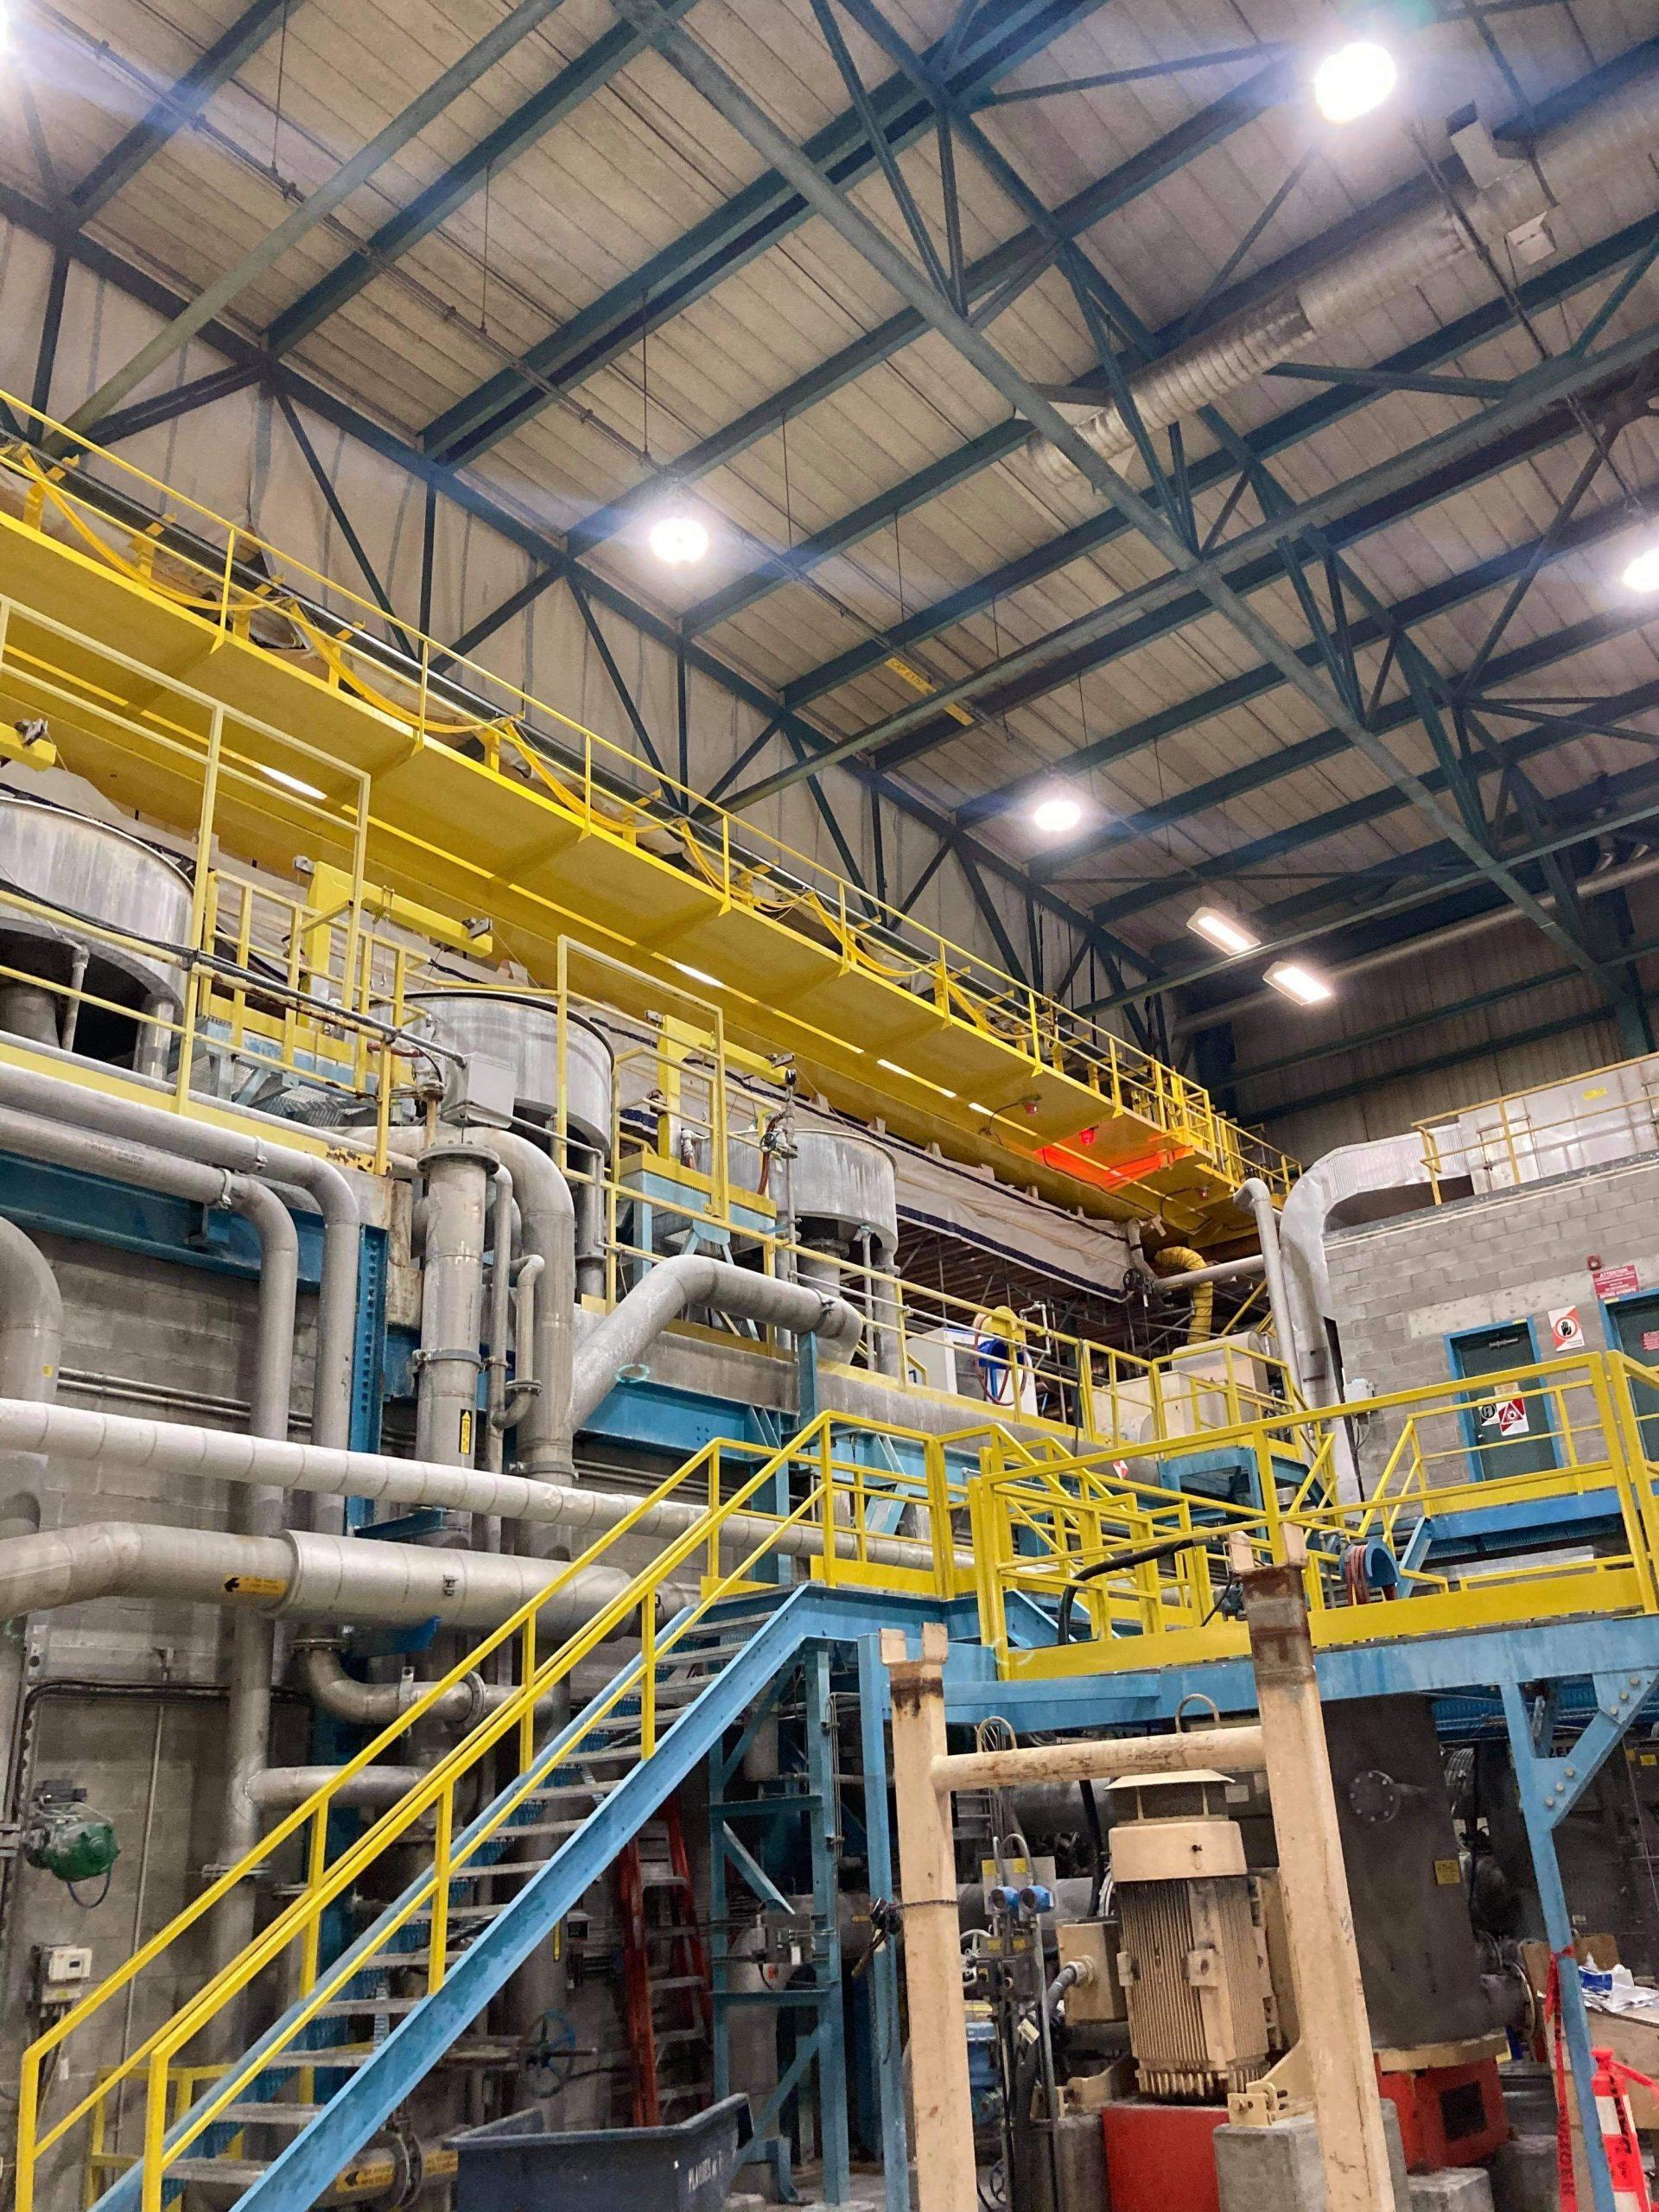 Fives Services: Refurbishment of an overhead crane